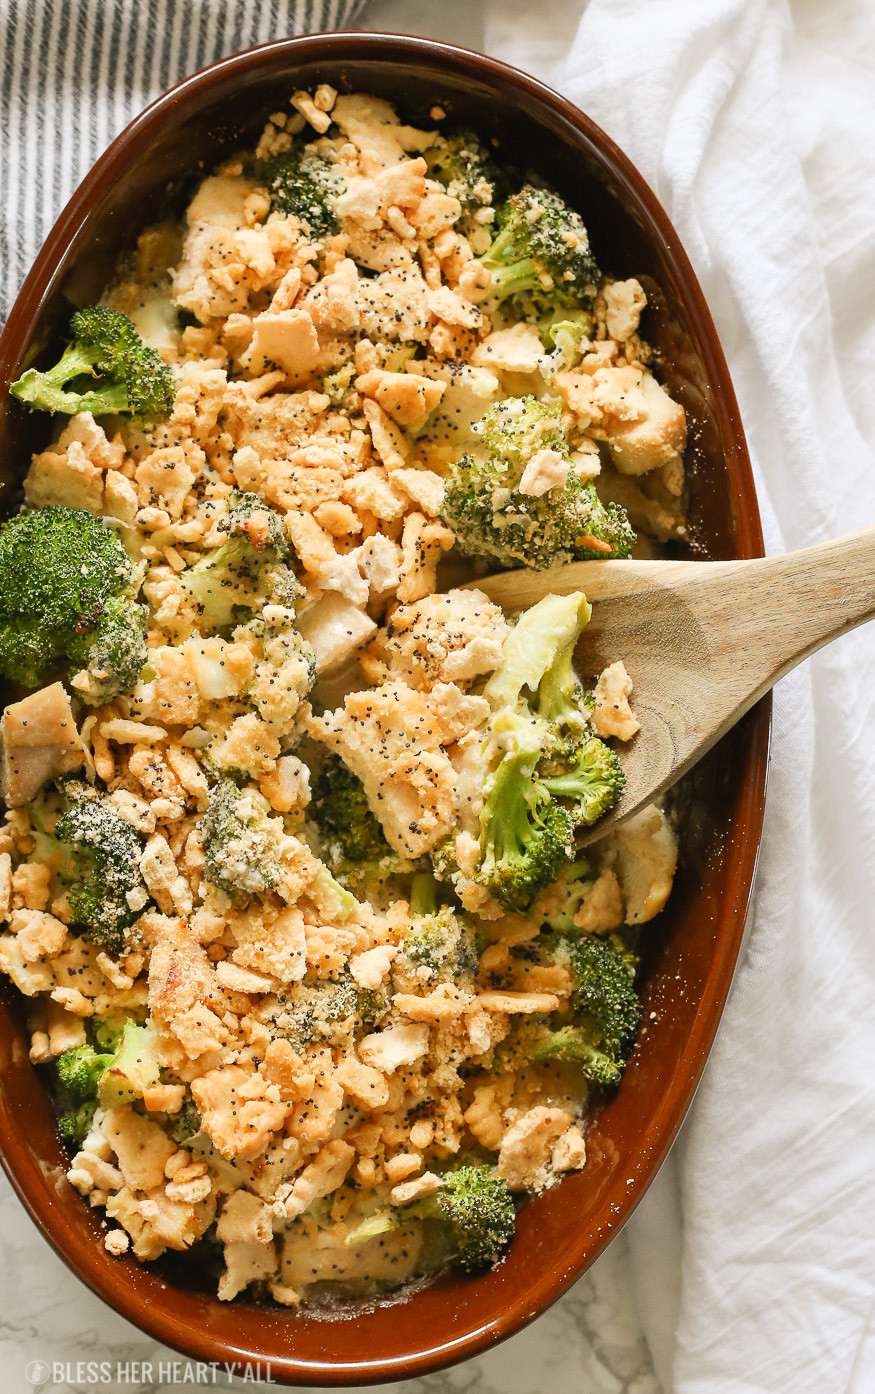 Heart Healthy Chicken Casseroles  Skinny Gluten Free Chicken Poppy Seed Casserole Bless